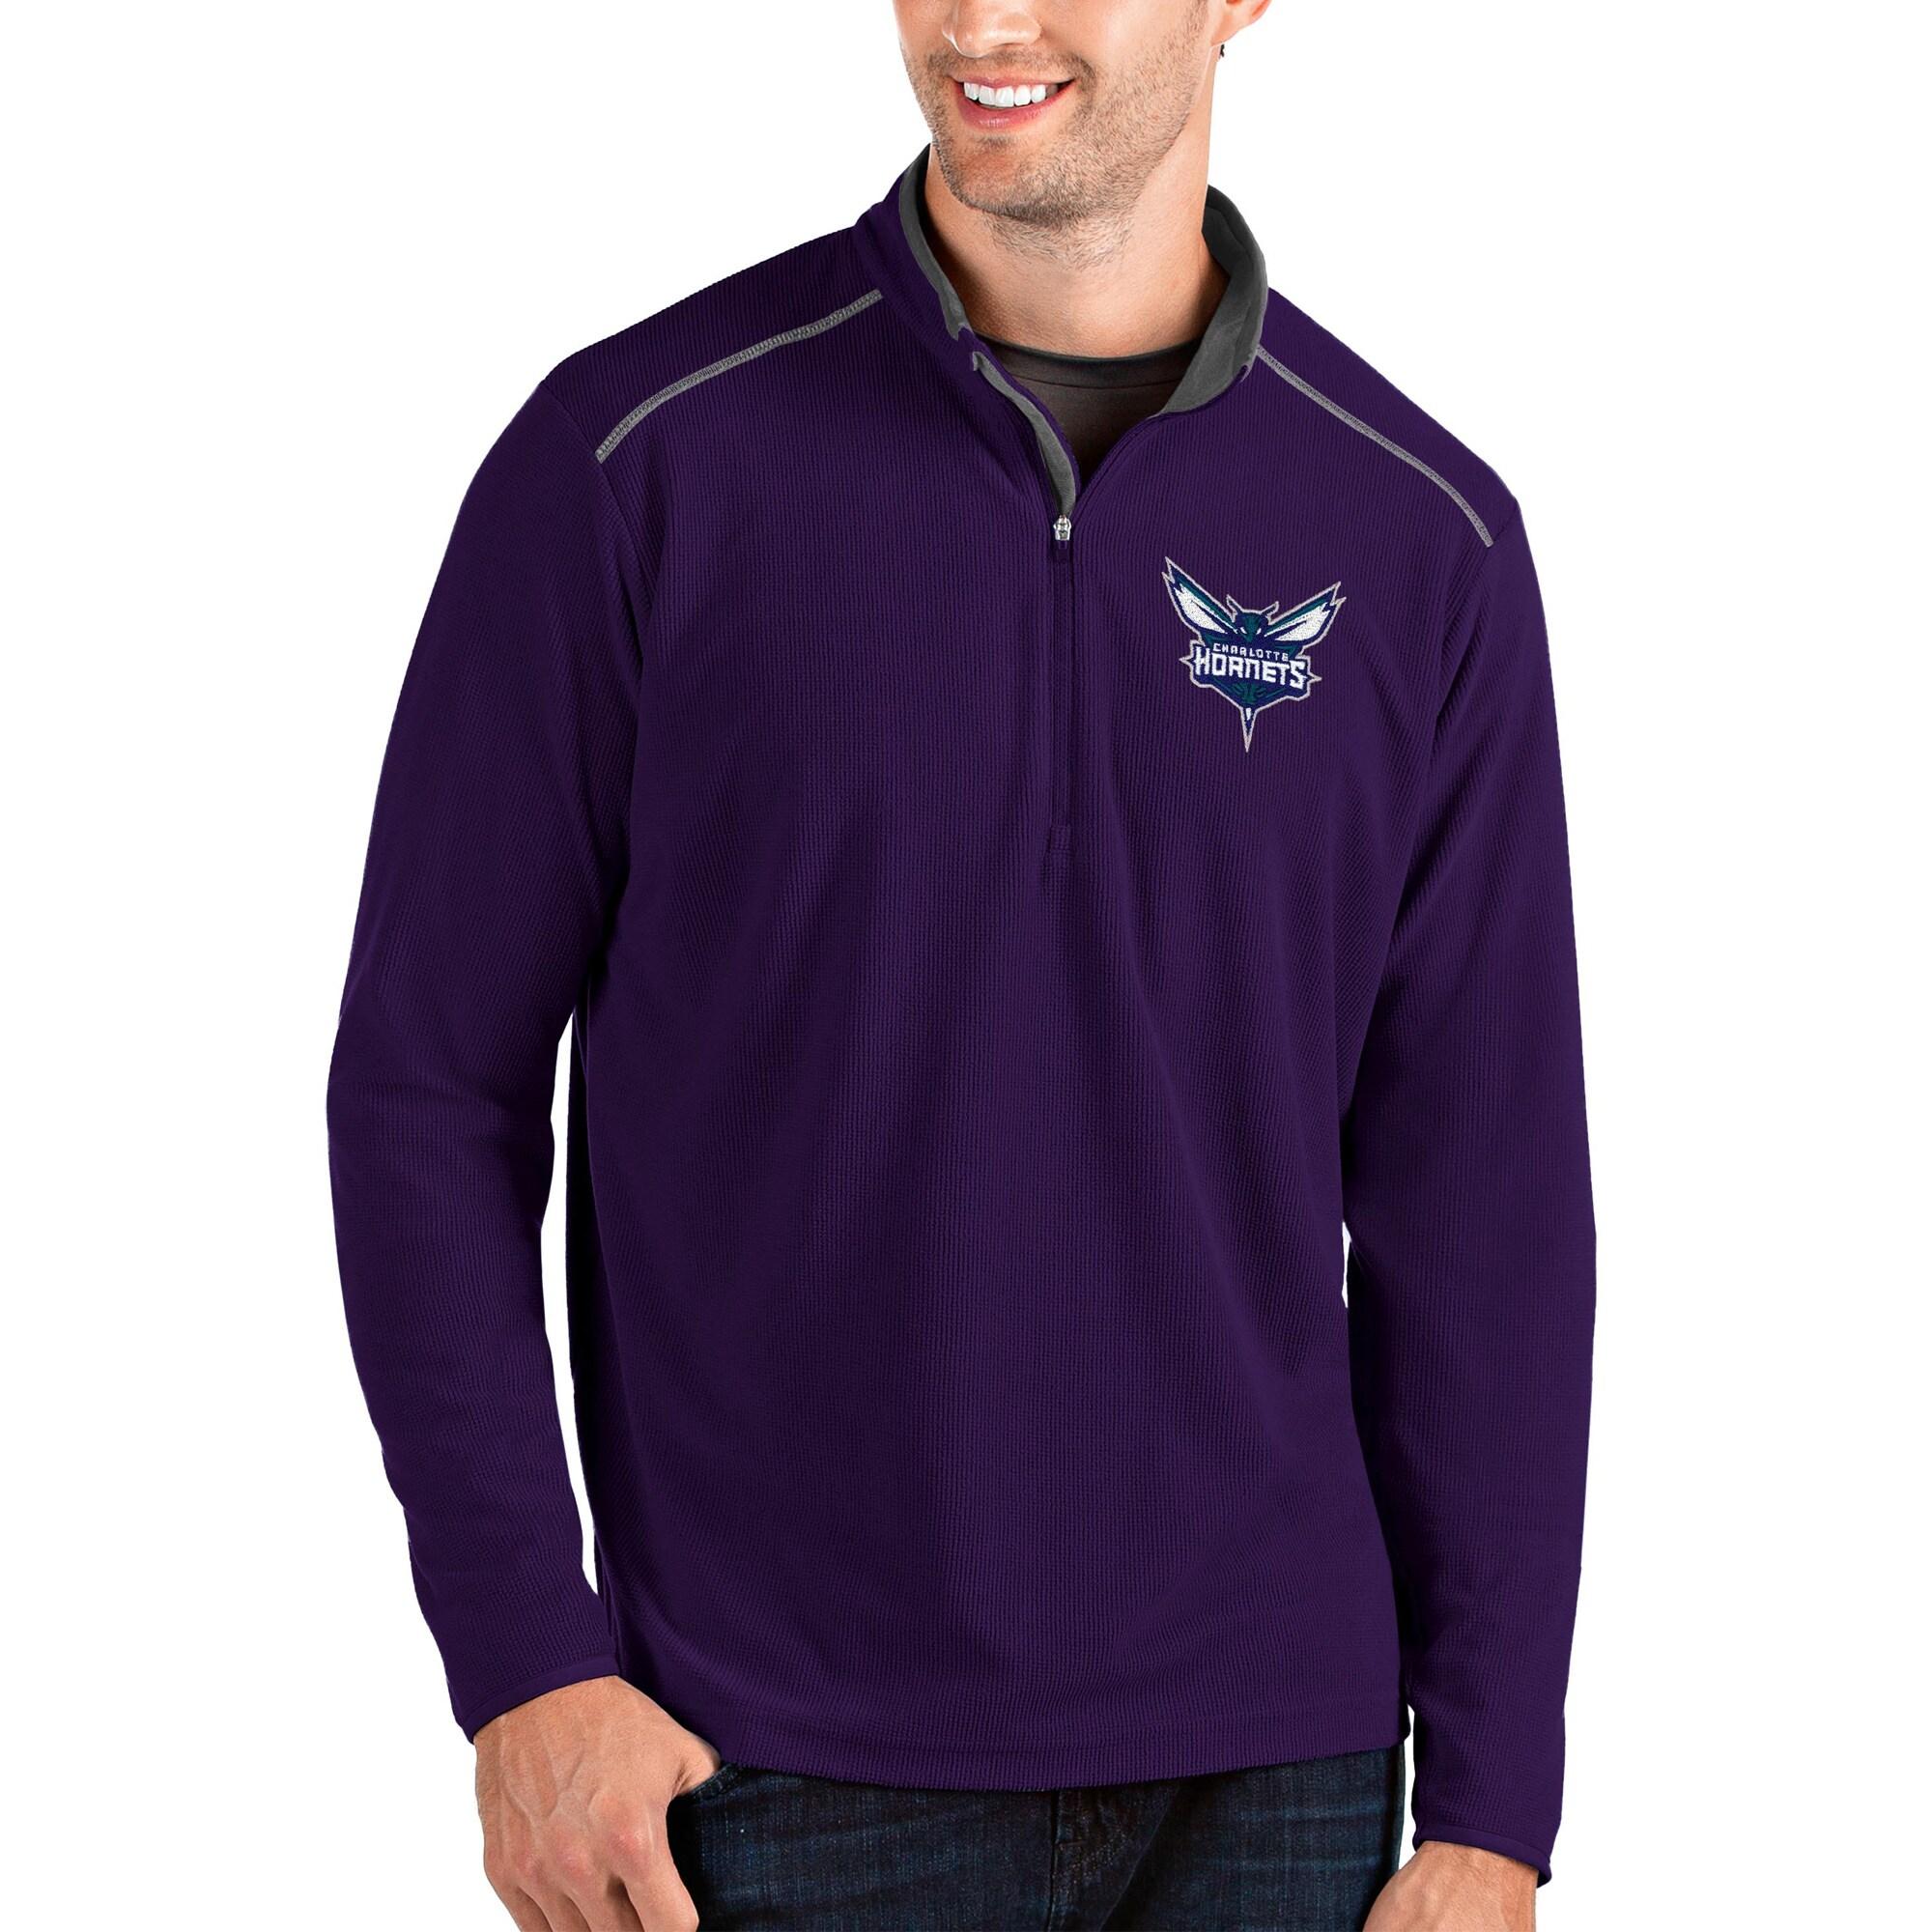 Charlotte Hornets Antigua Glacier Quarter-Zip Pullover Jacket - Purple/Gray